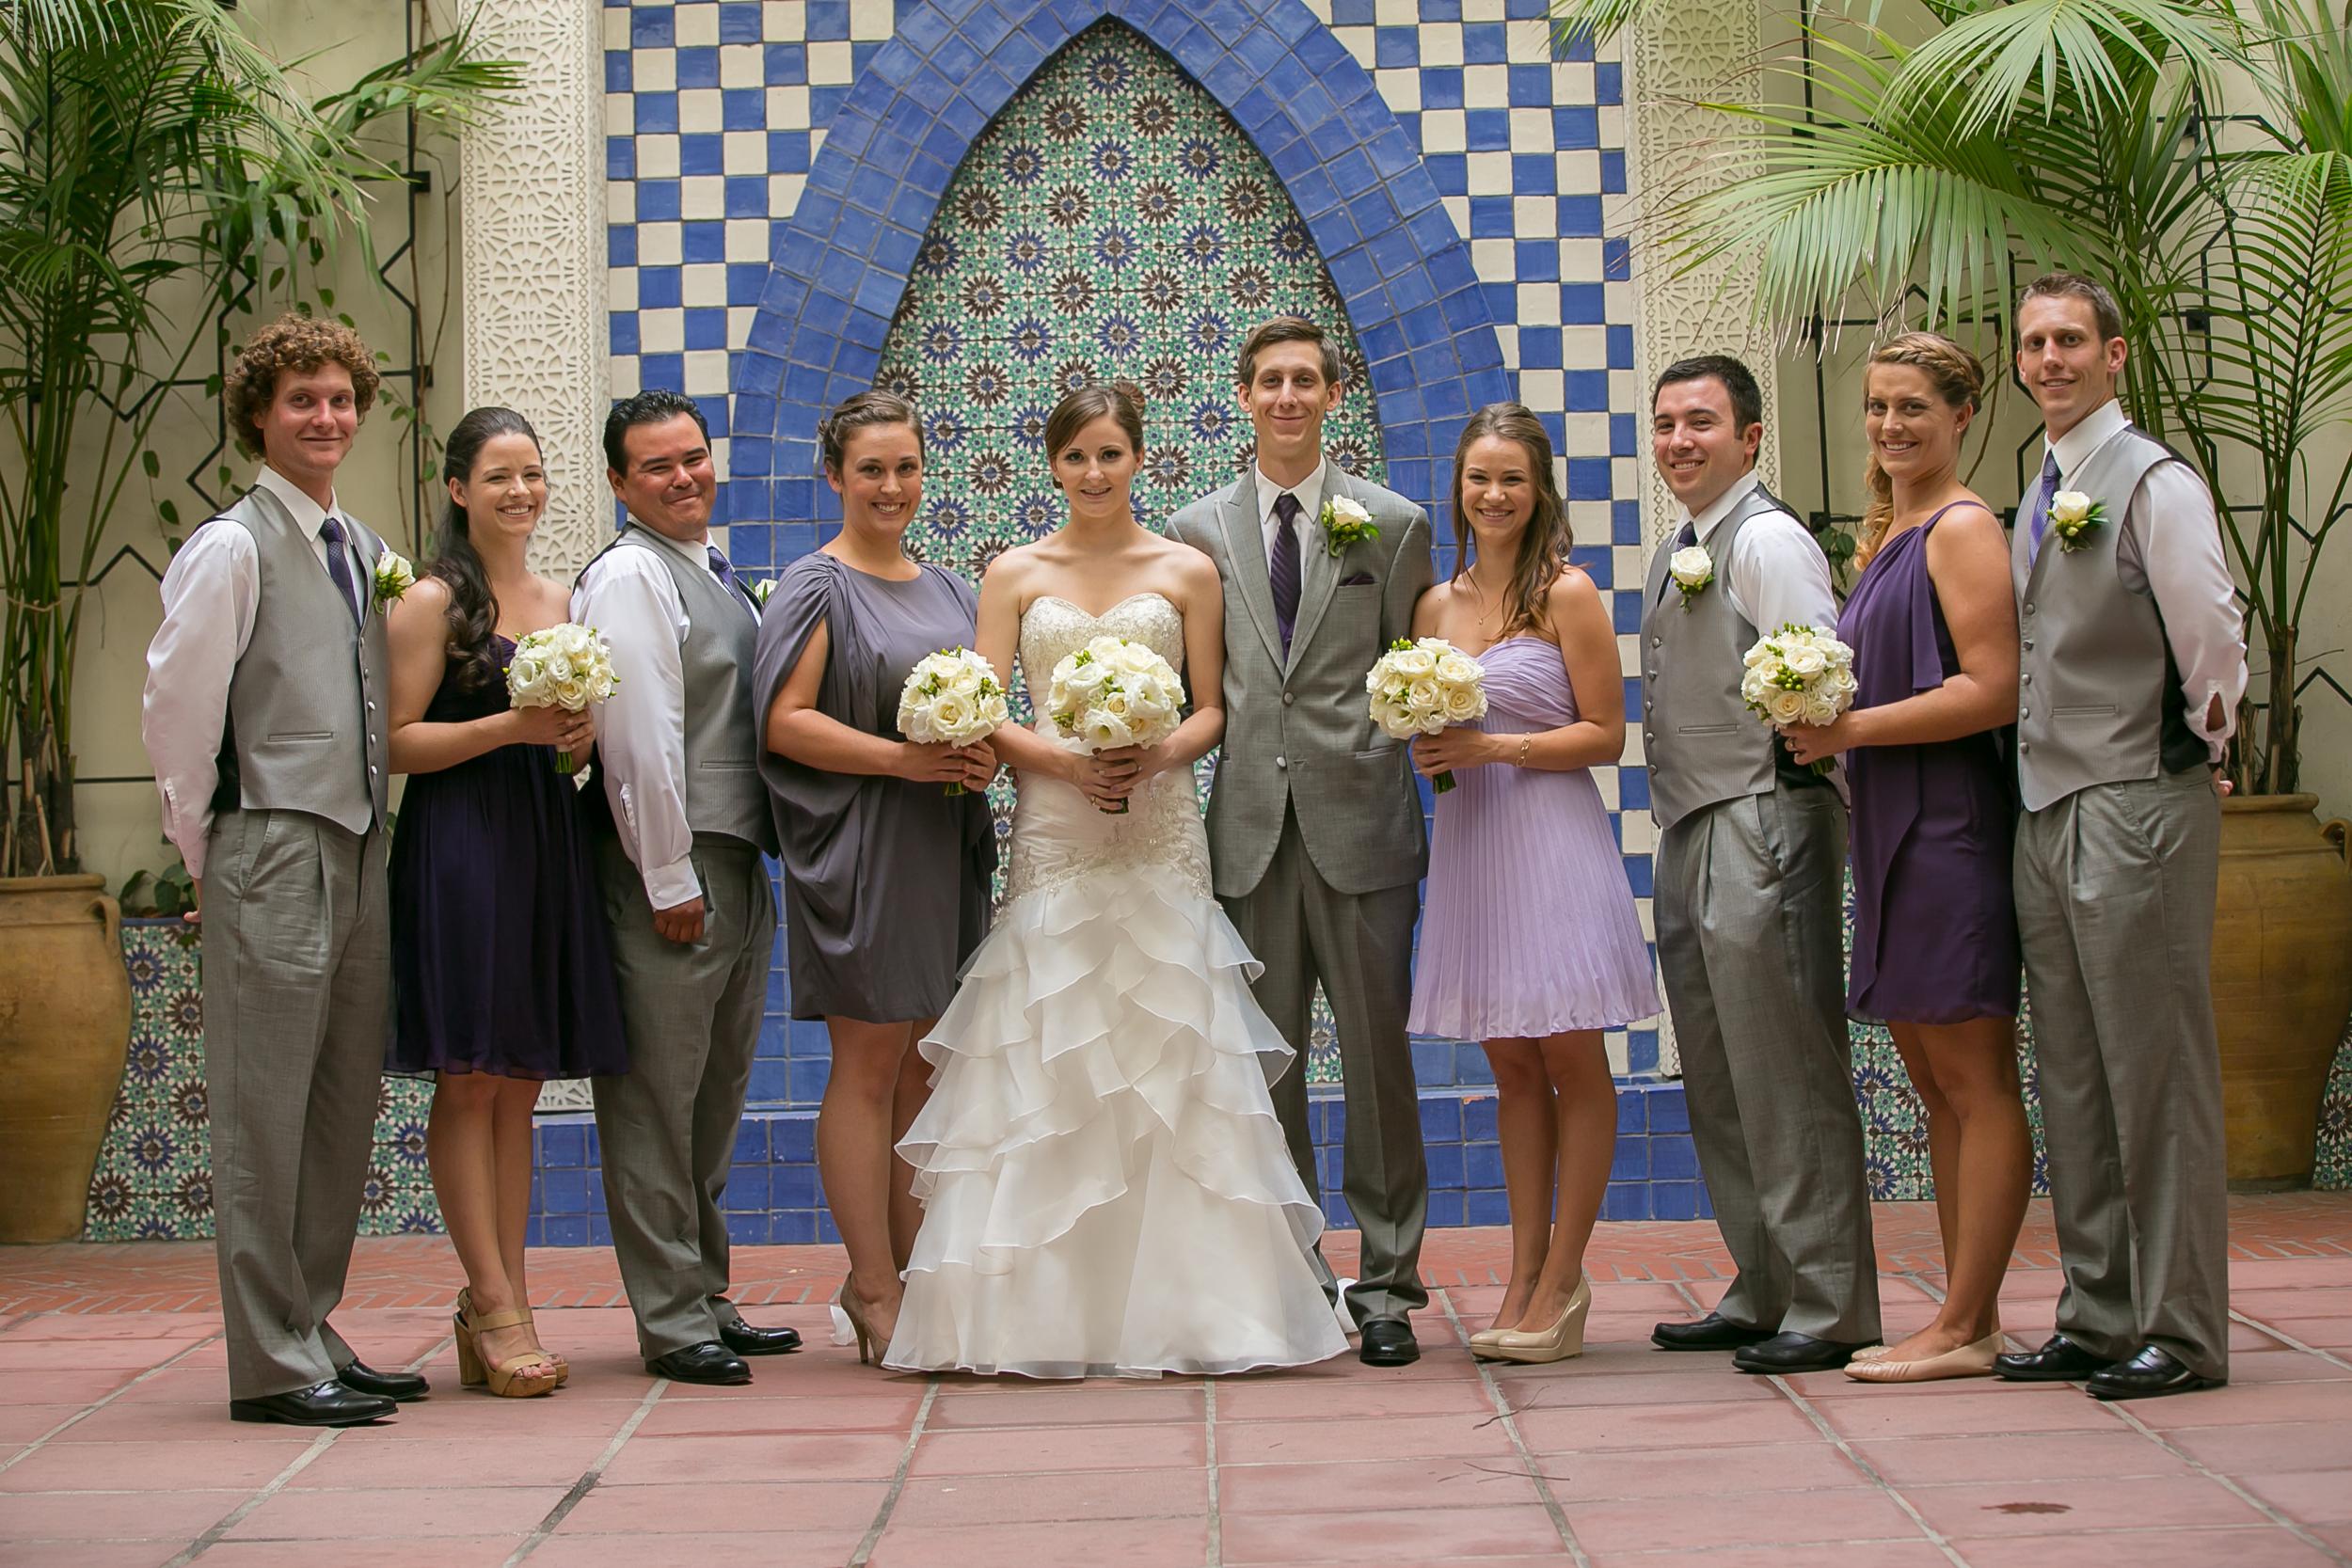 MJBrown[Wedding]_036.jpg